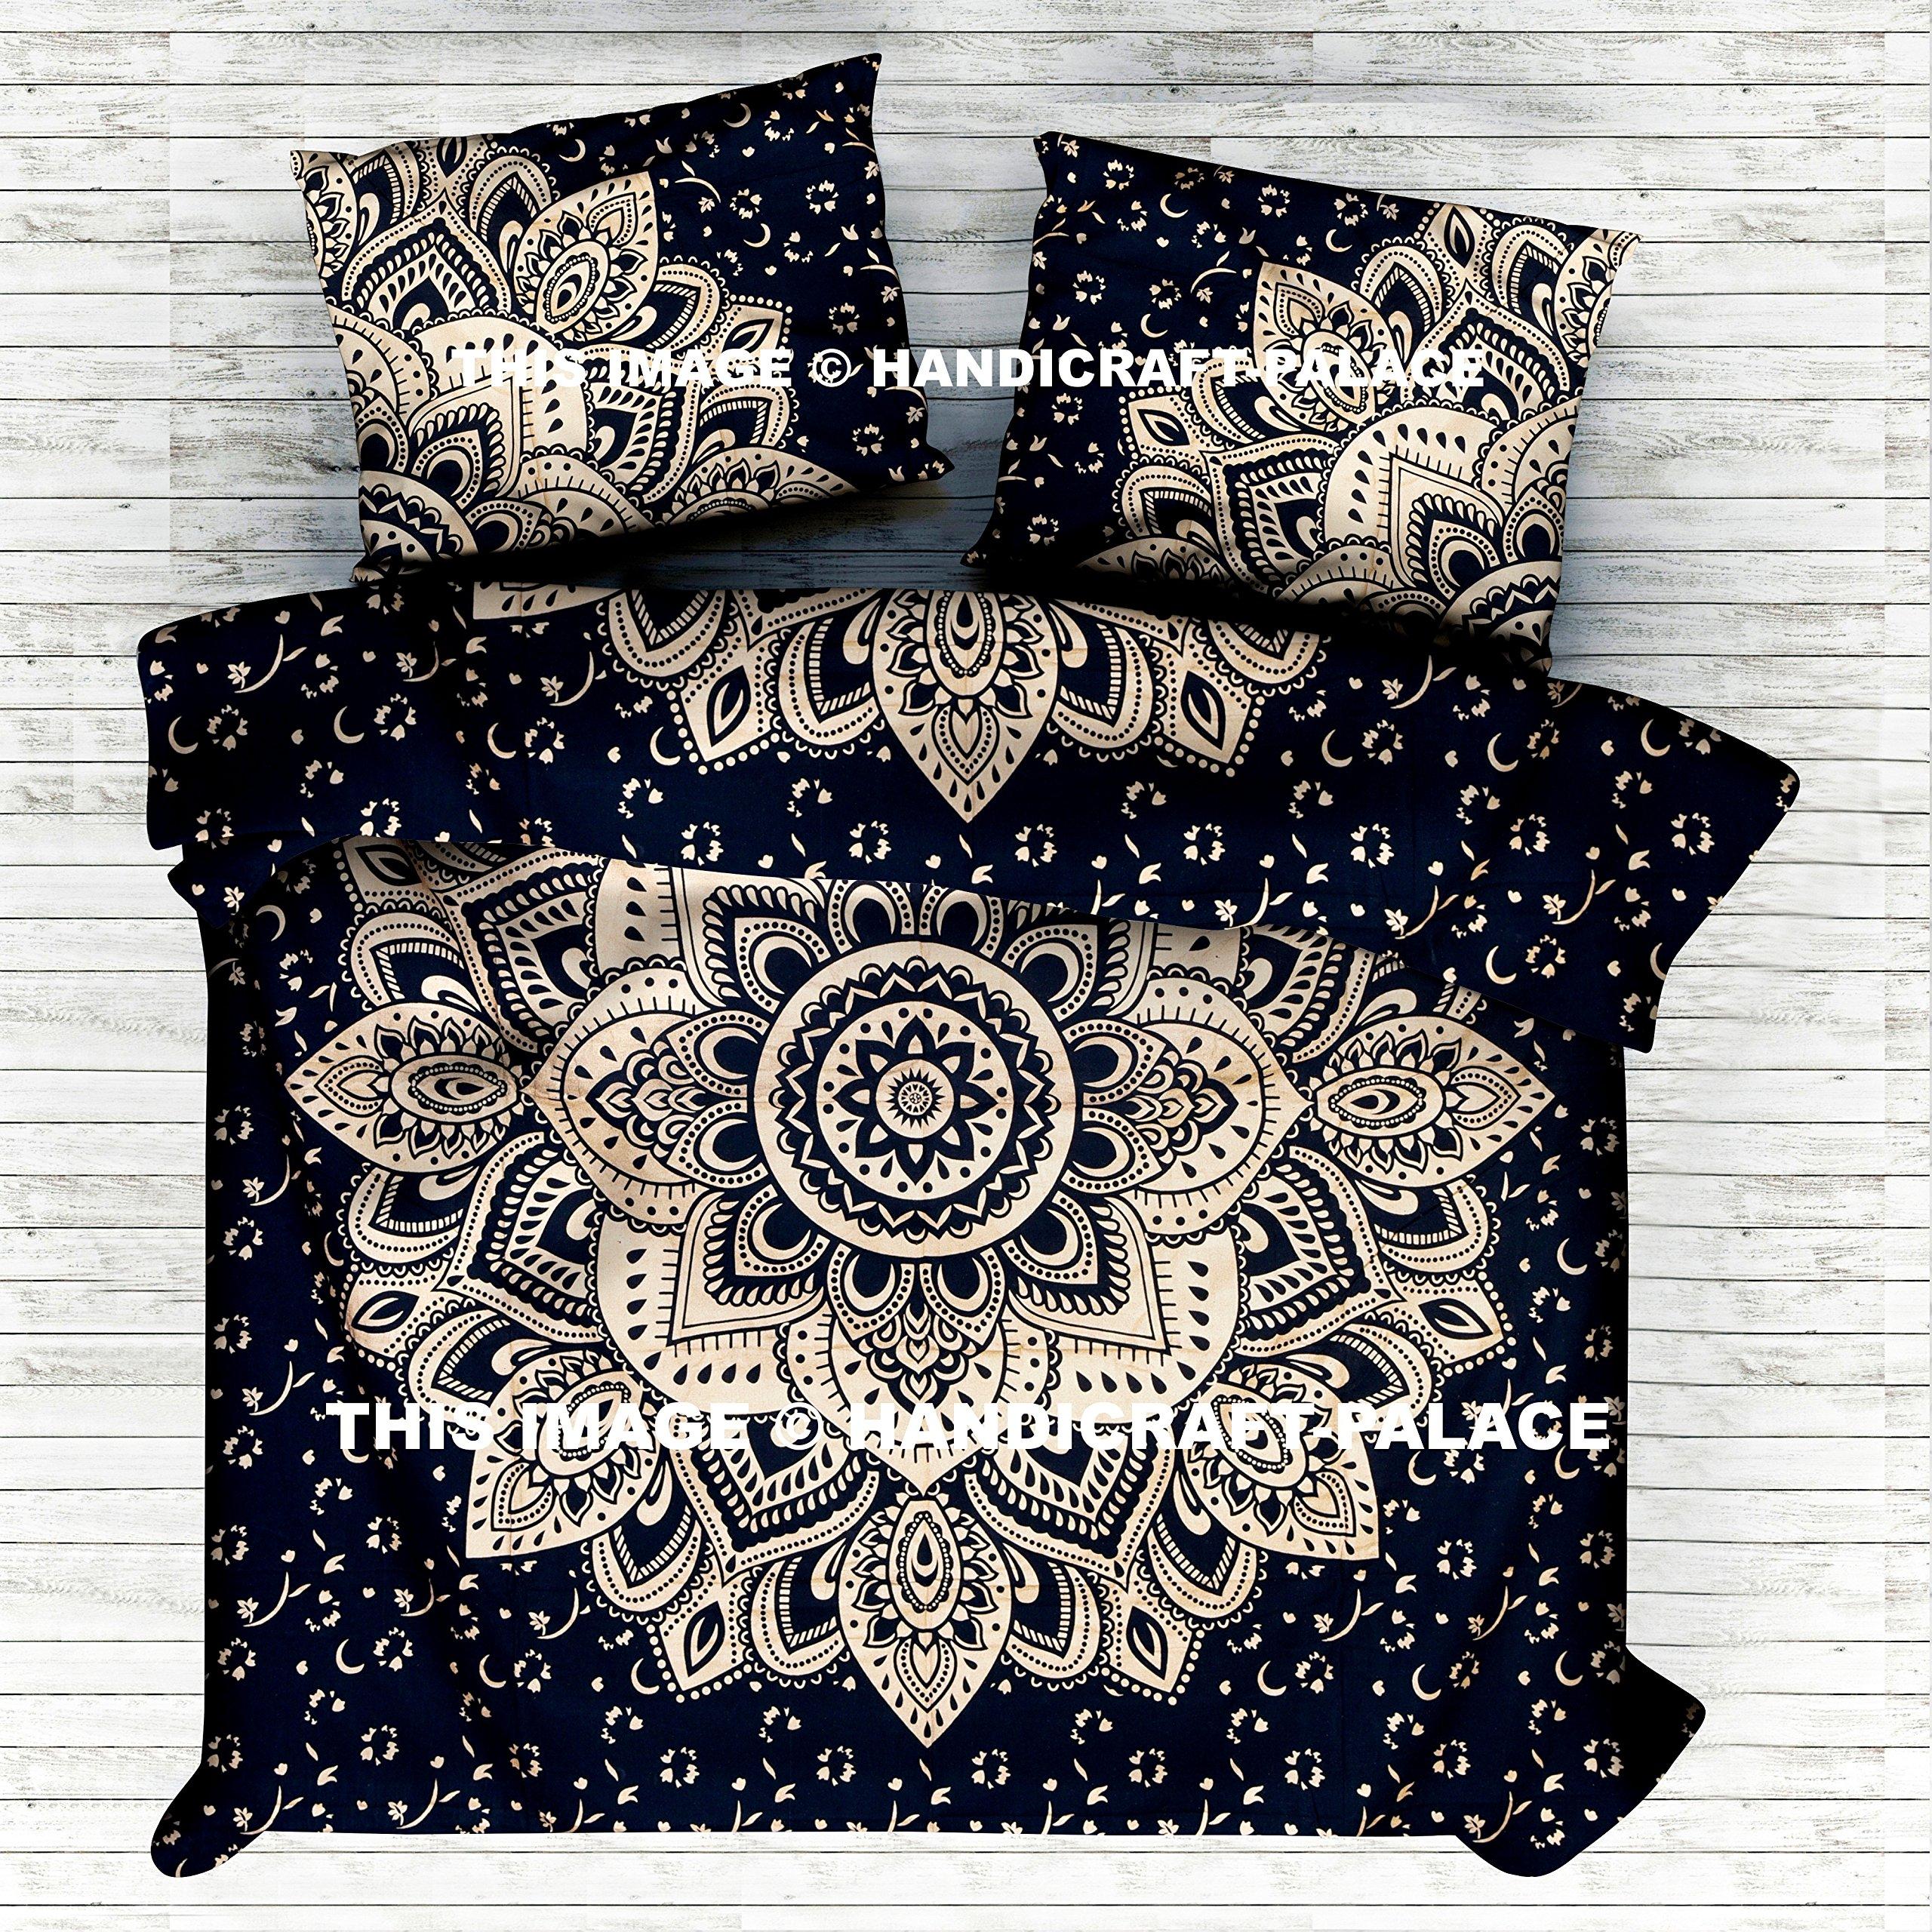 Indian Ombre Mandala Queen Size Comforter Hippie Boho Cotton Doona Duvet Cover Indian Comforter Mandala Hippie Bohemian Queen Quilt Cover Set By ''Handicraft-Palace''